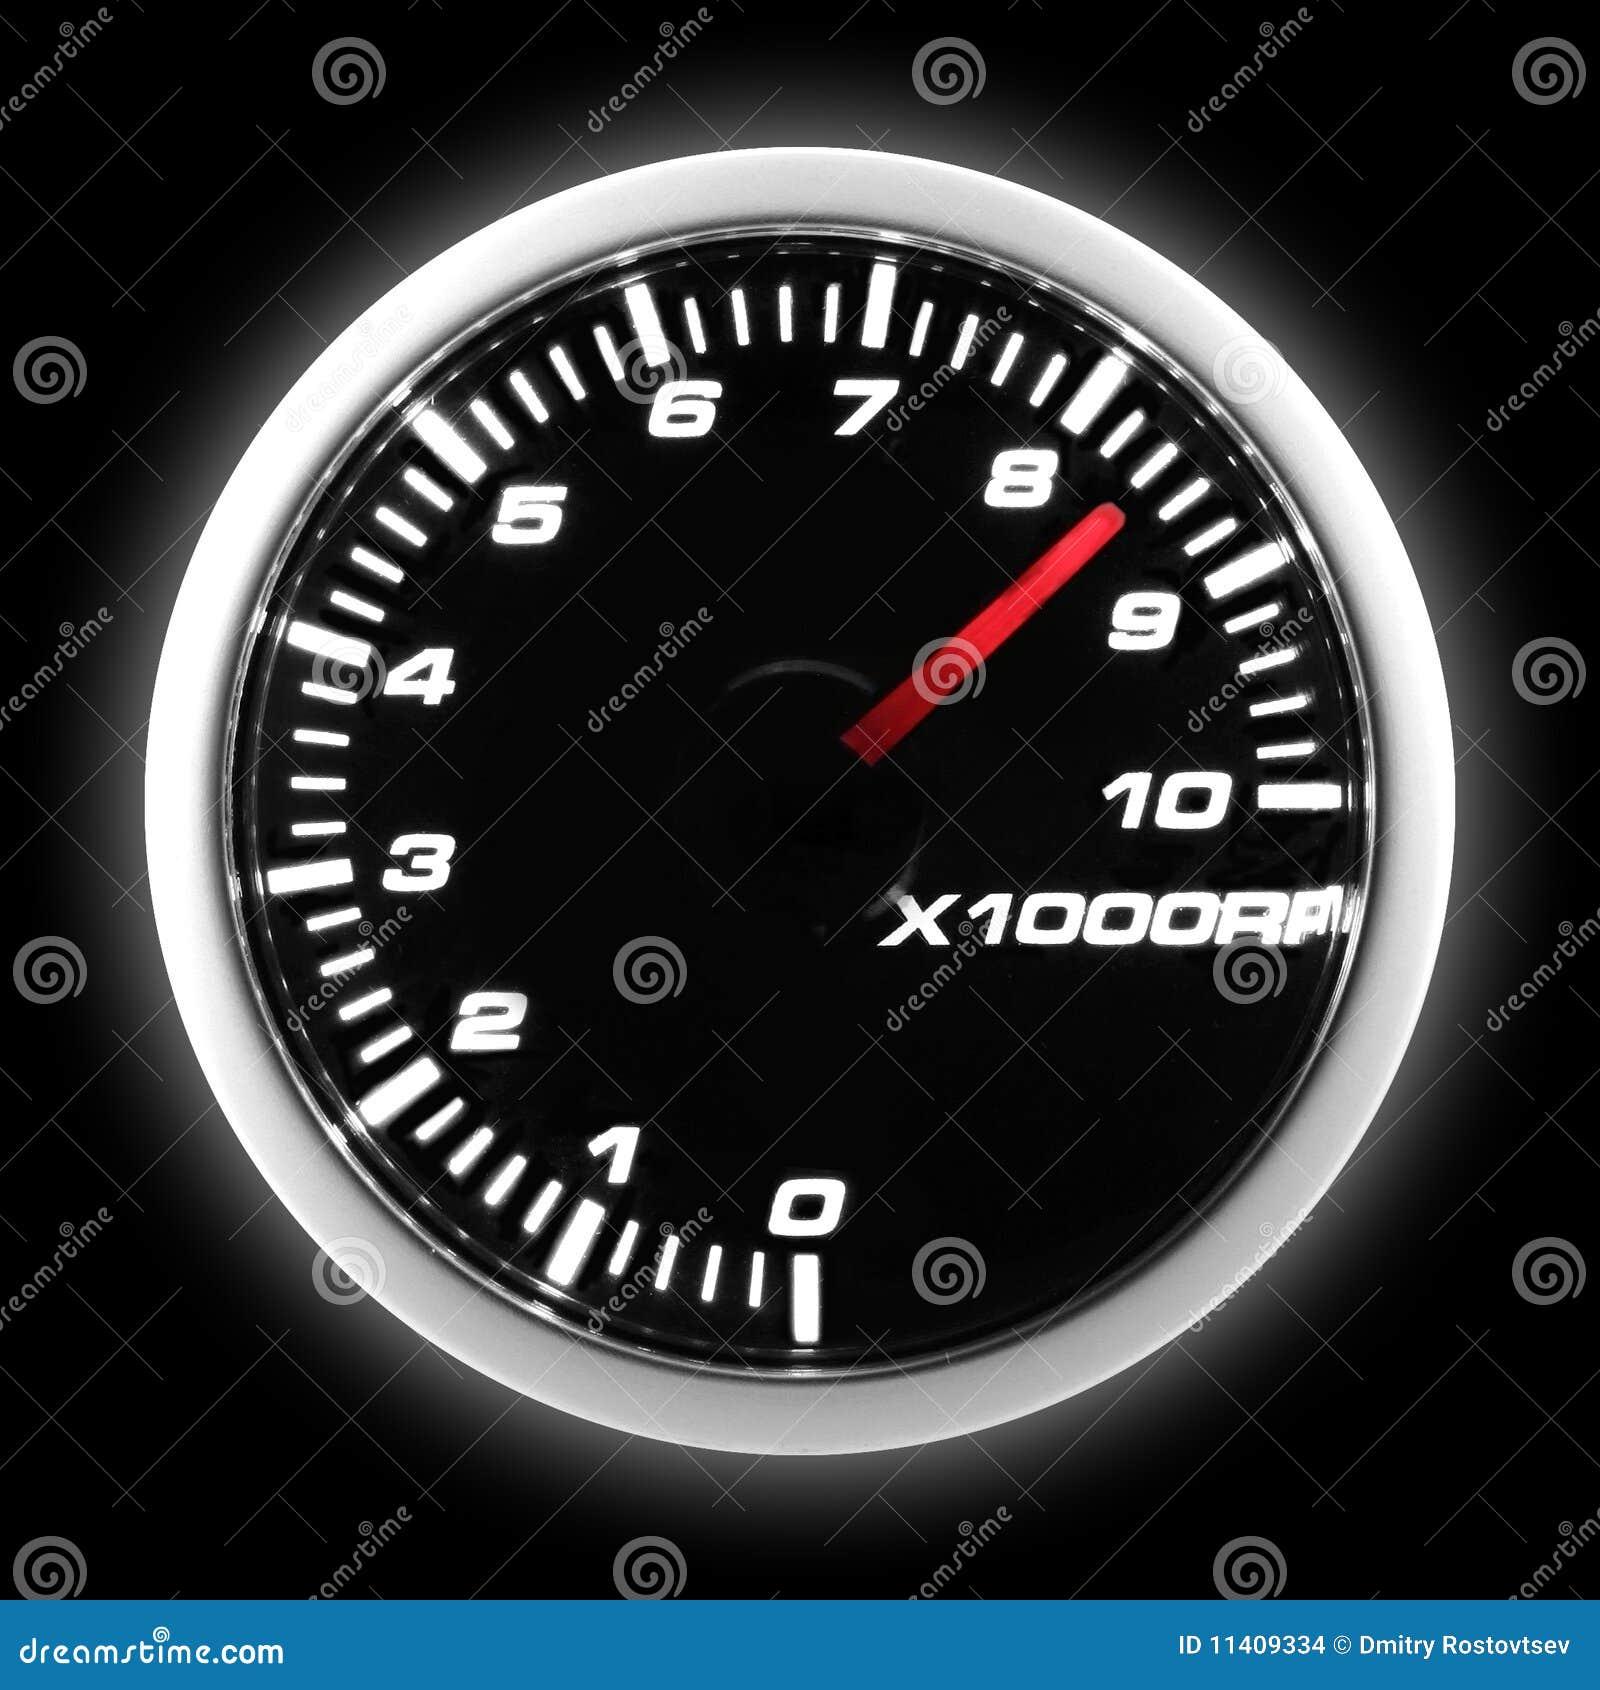 Car tachometer at maximum level on black background.: dreamstime.com/stock-images-tachometer-image11409334